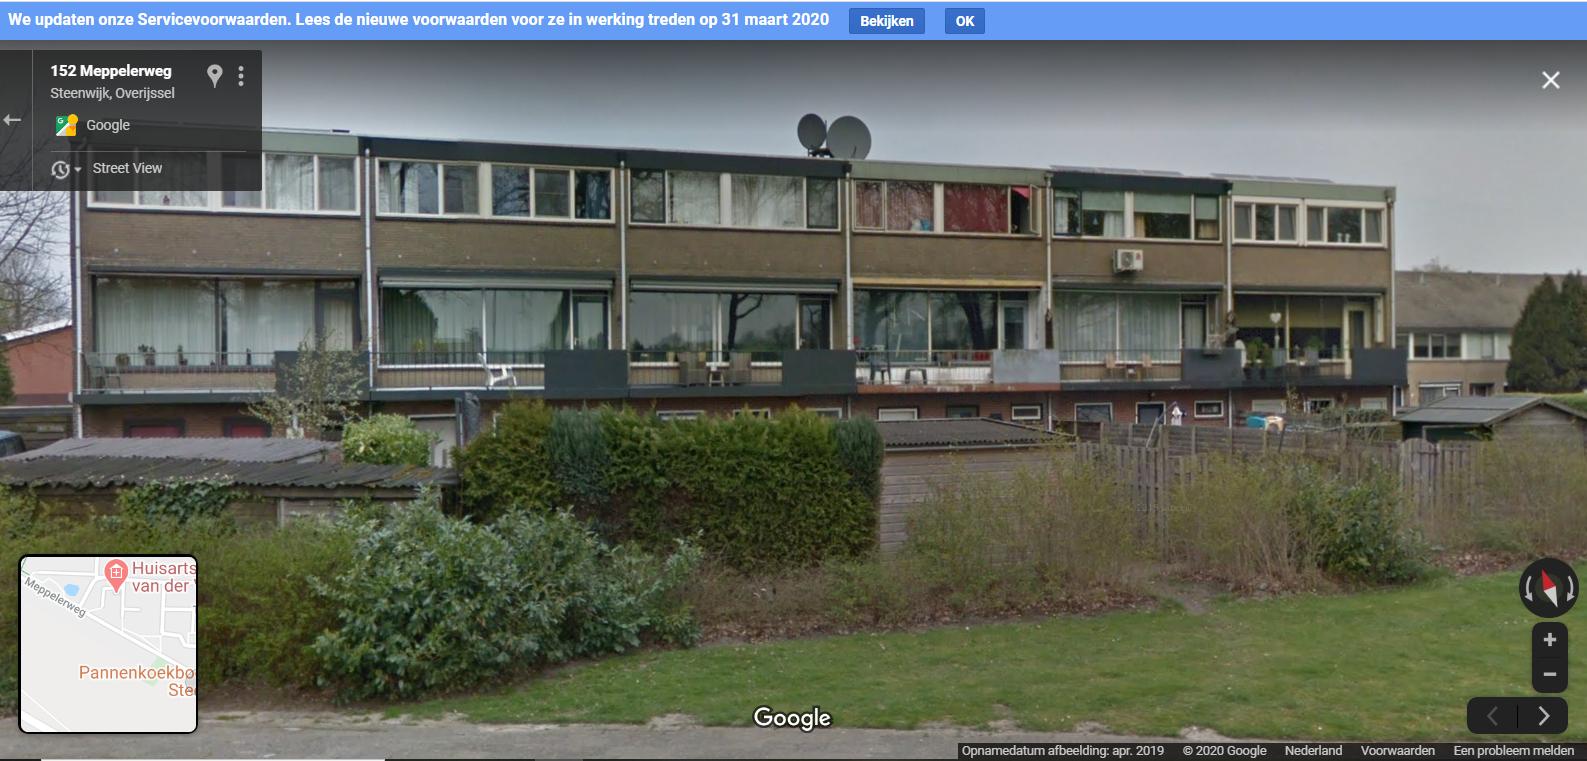 Steenwijk.png.ef1914b1b1bfe23951d087978958b6f9.png